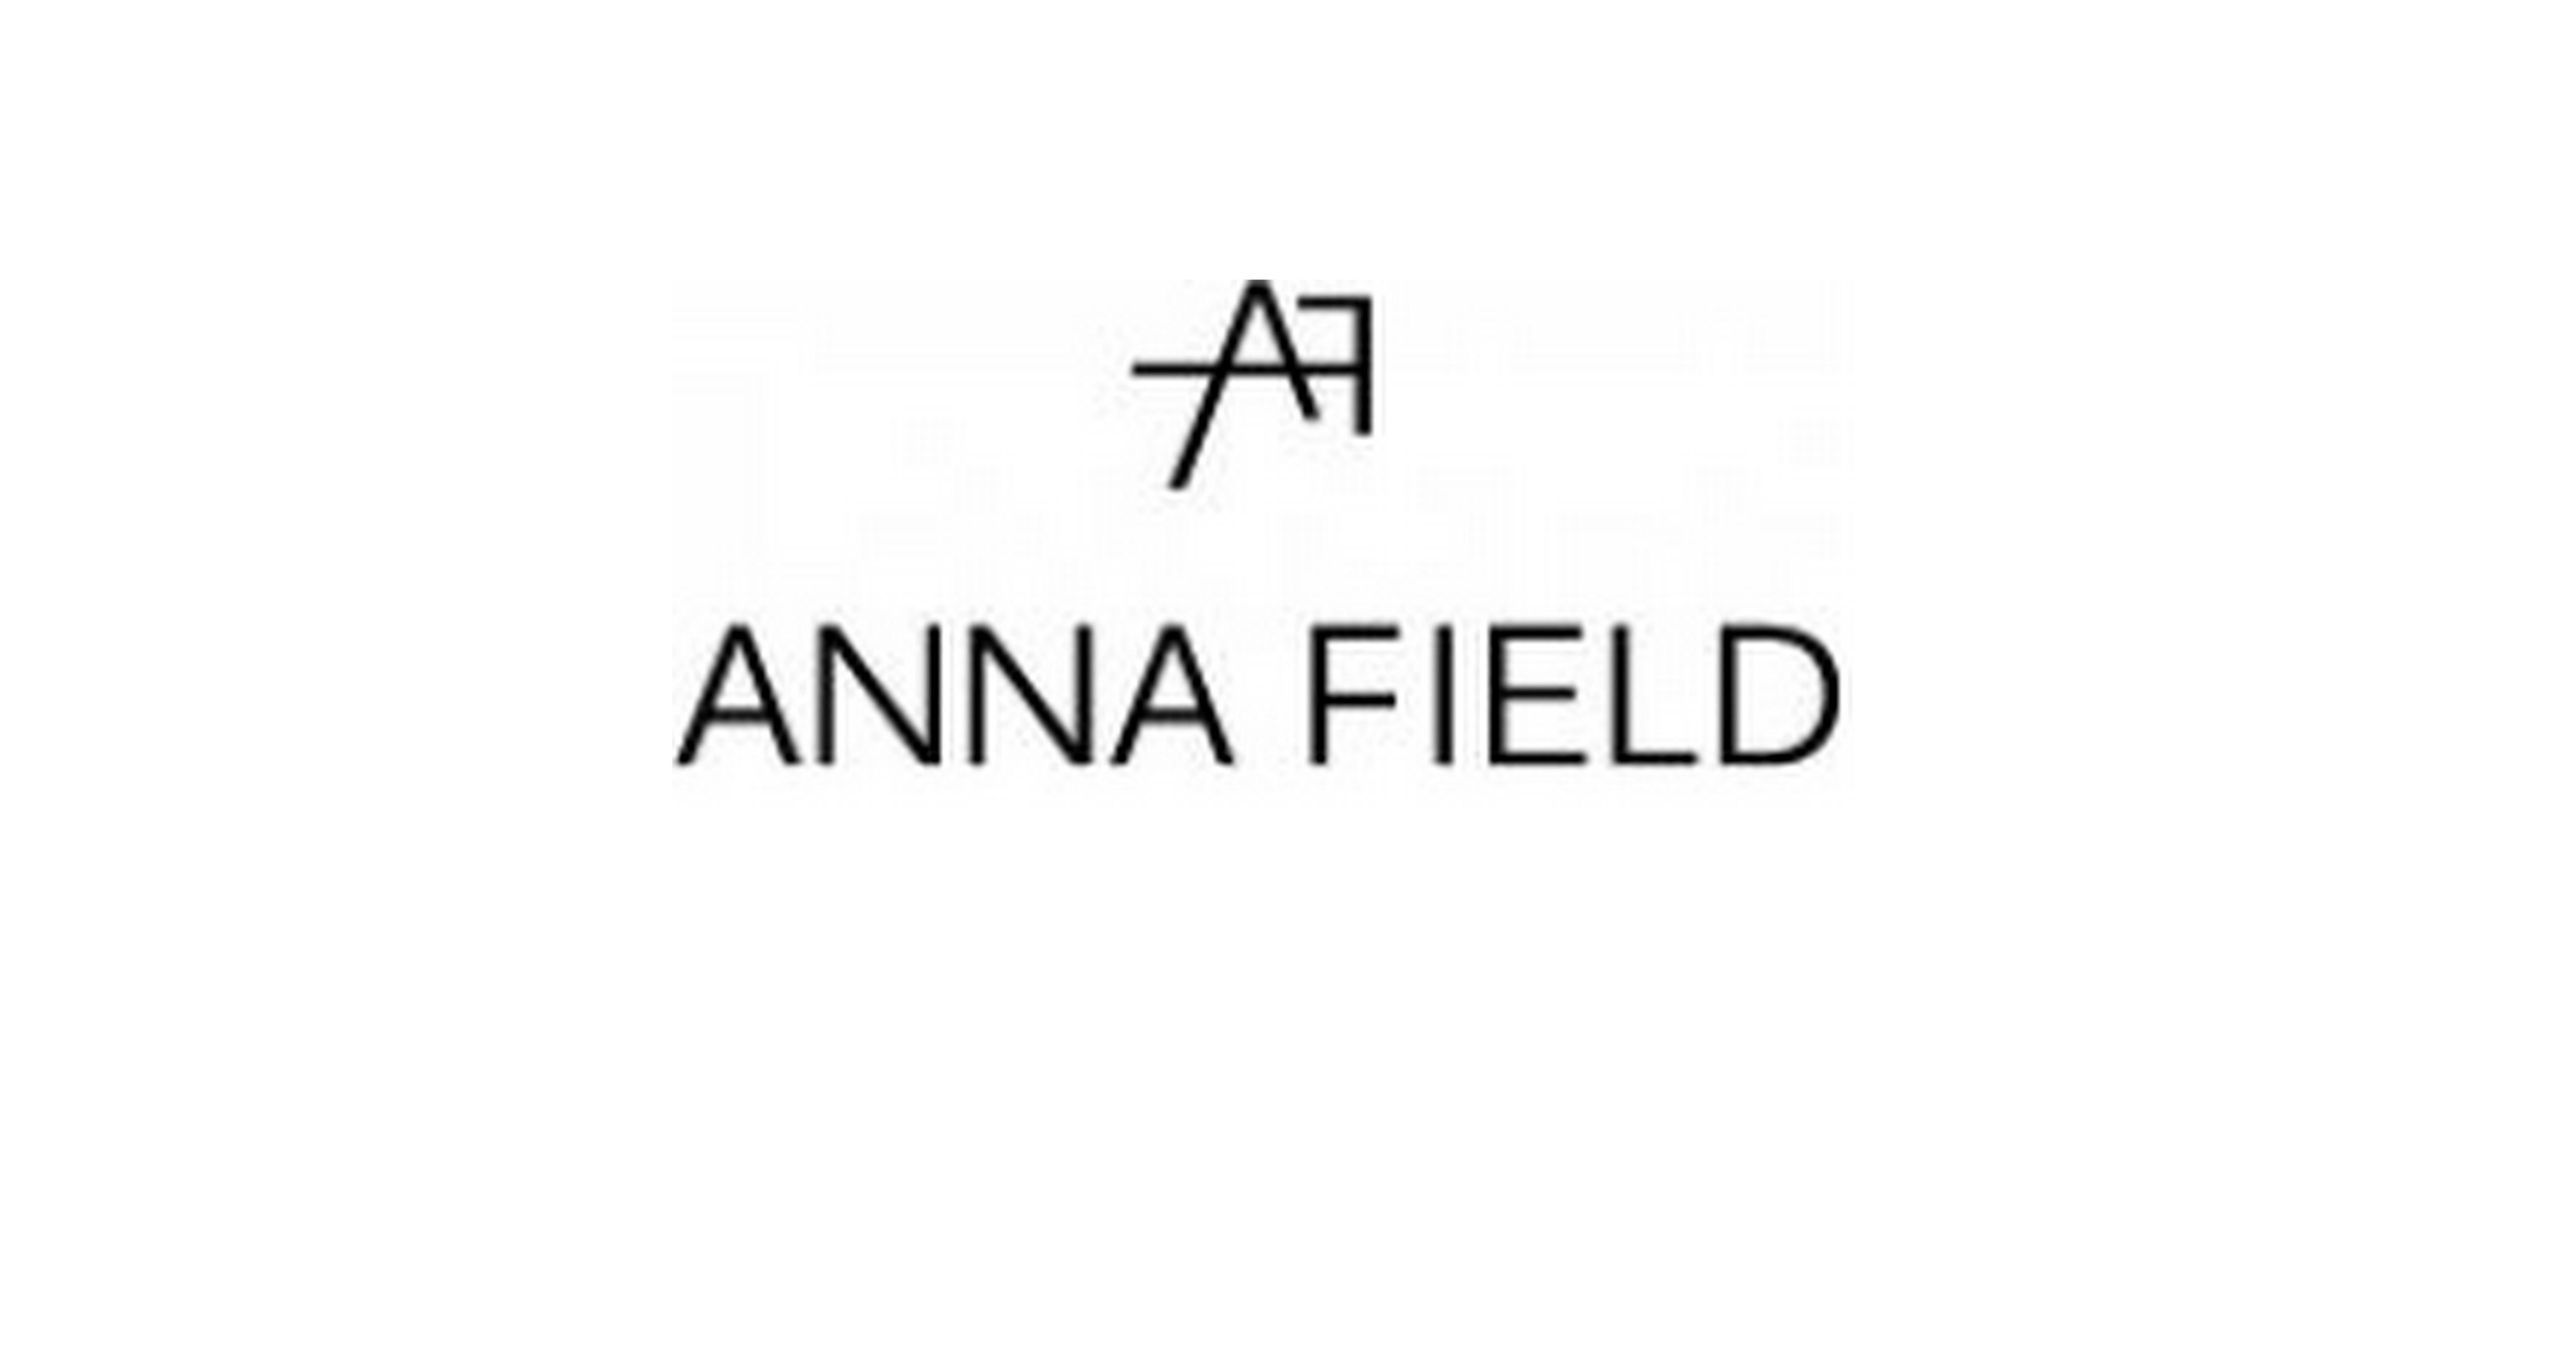 anna field logo